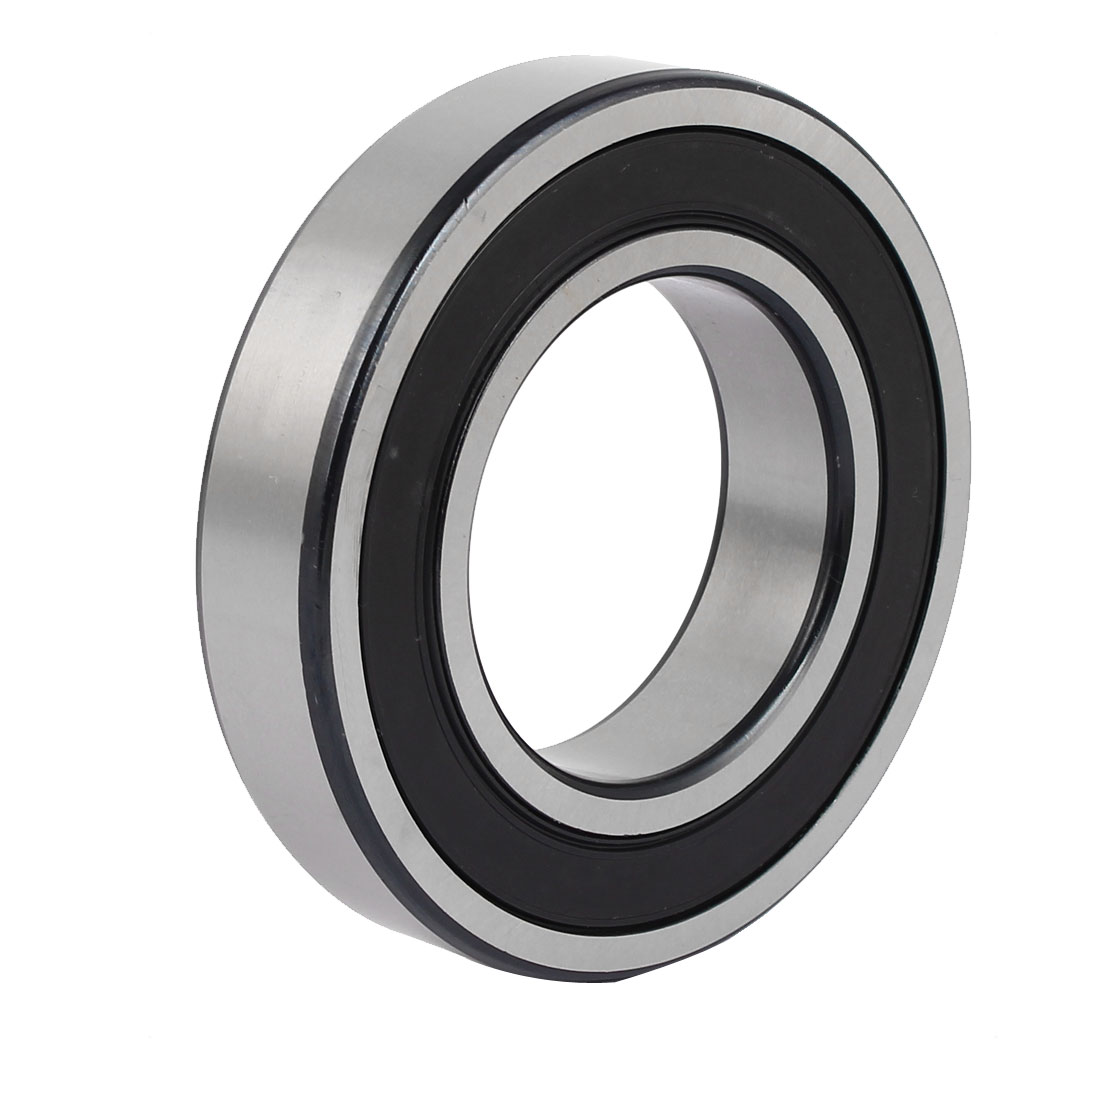 2RS6212 110mm x 60mm x 22mm Single Row Double Shielded Deep Groove Ball Bearing